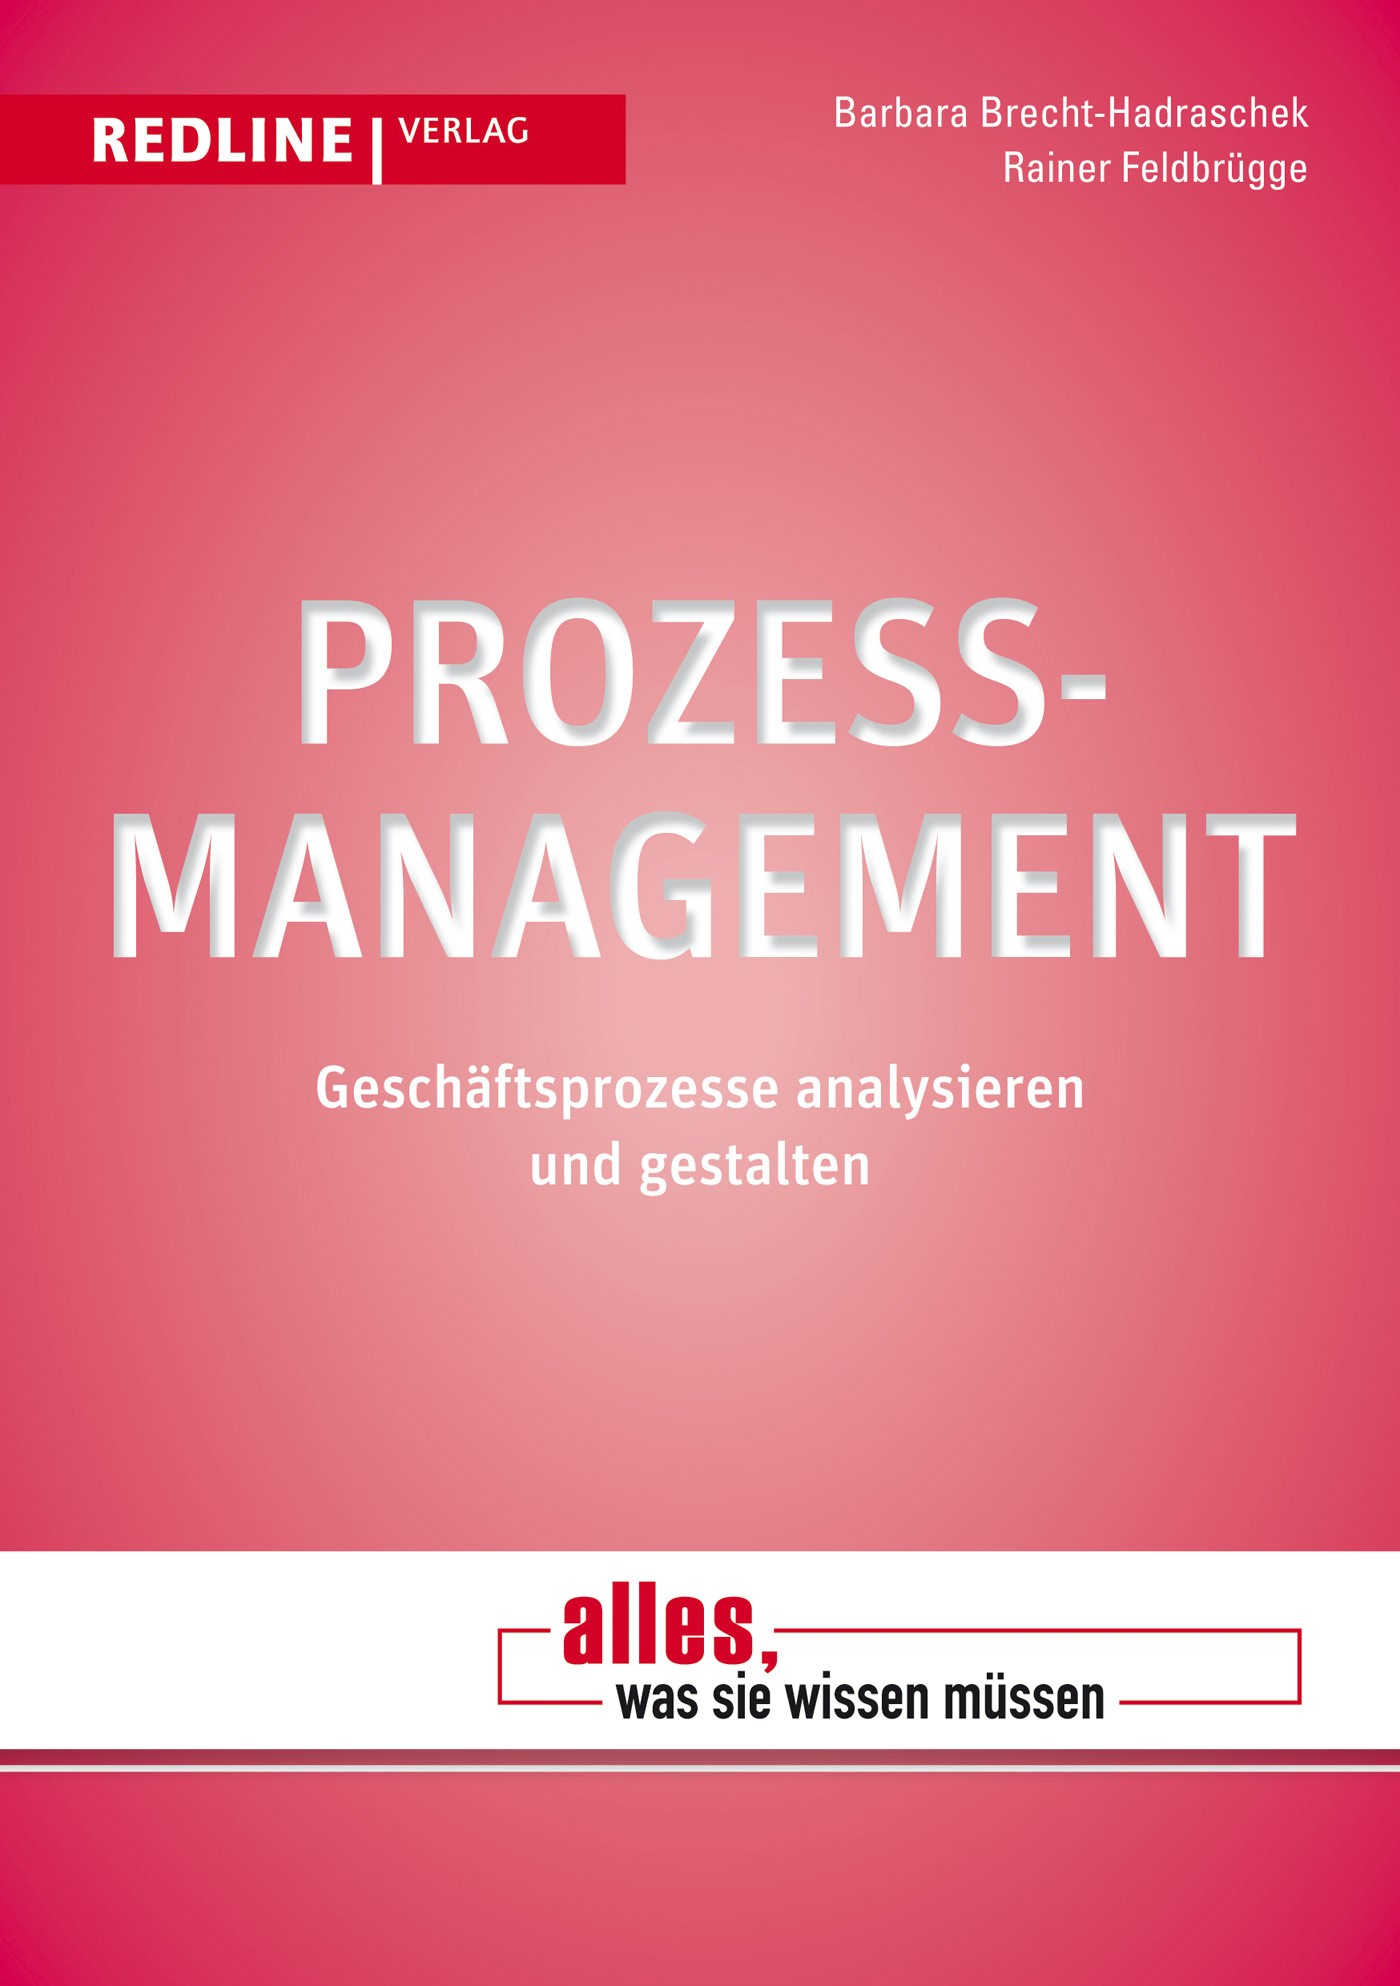 Prozessmanagement | Brecht-Hadraschek / Feldbrügge, 2013 (Cover)